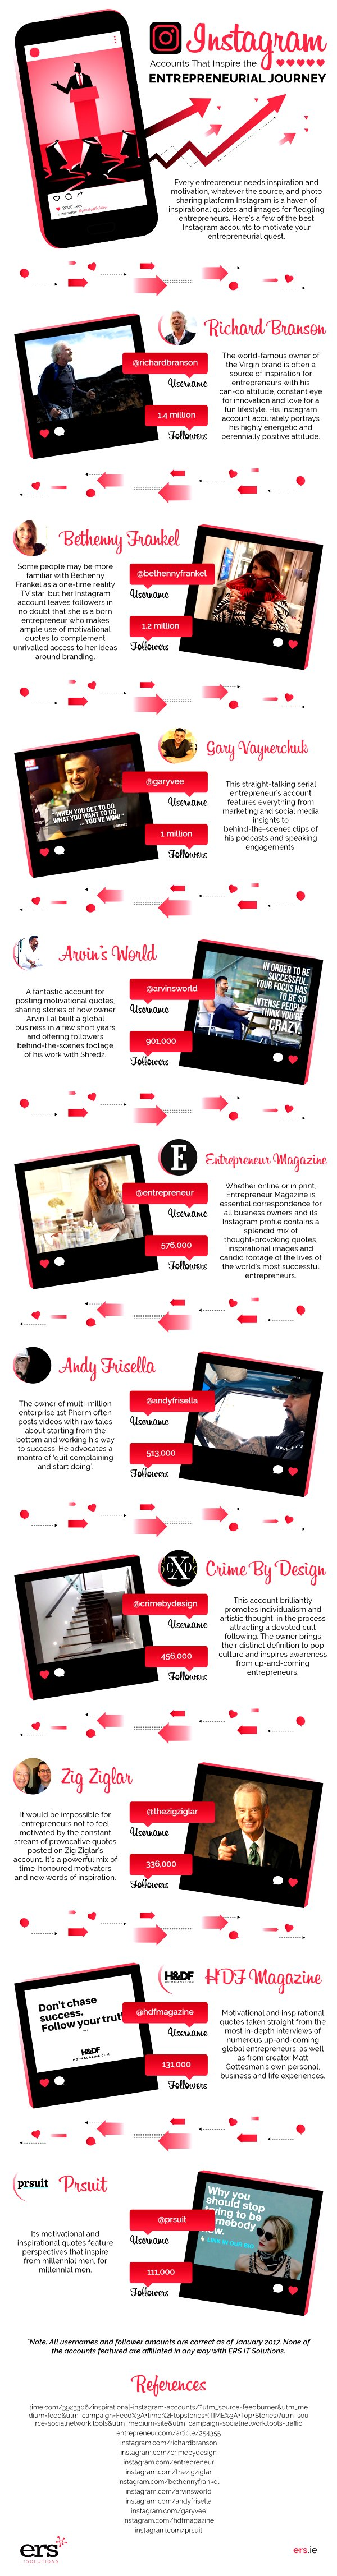 Instagram Accounts to Inspire the Entrepreneurial Journey 1